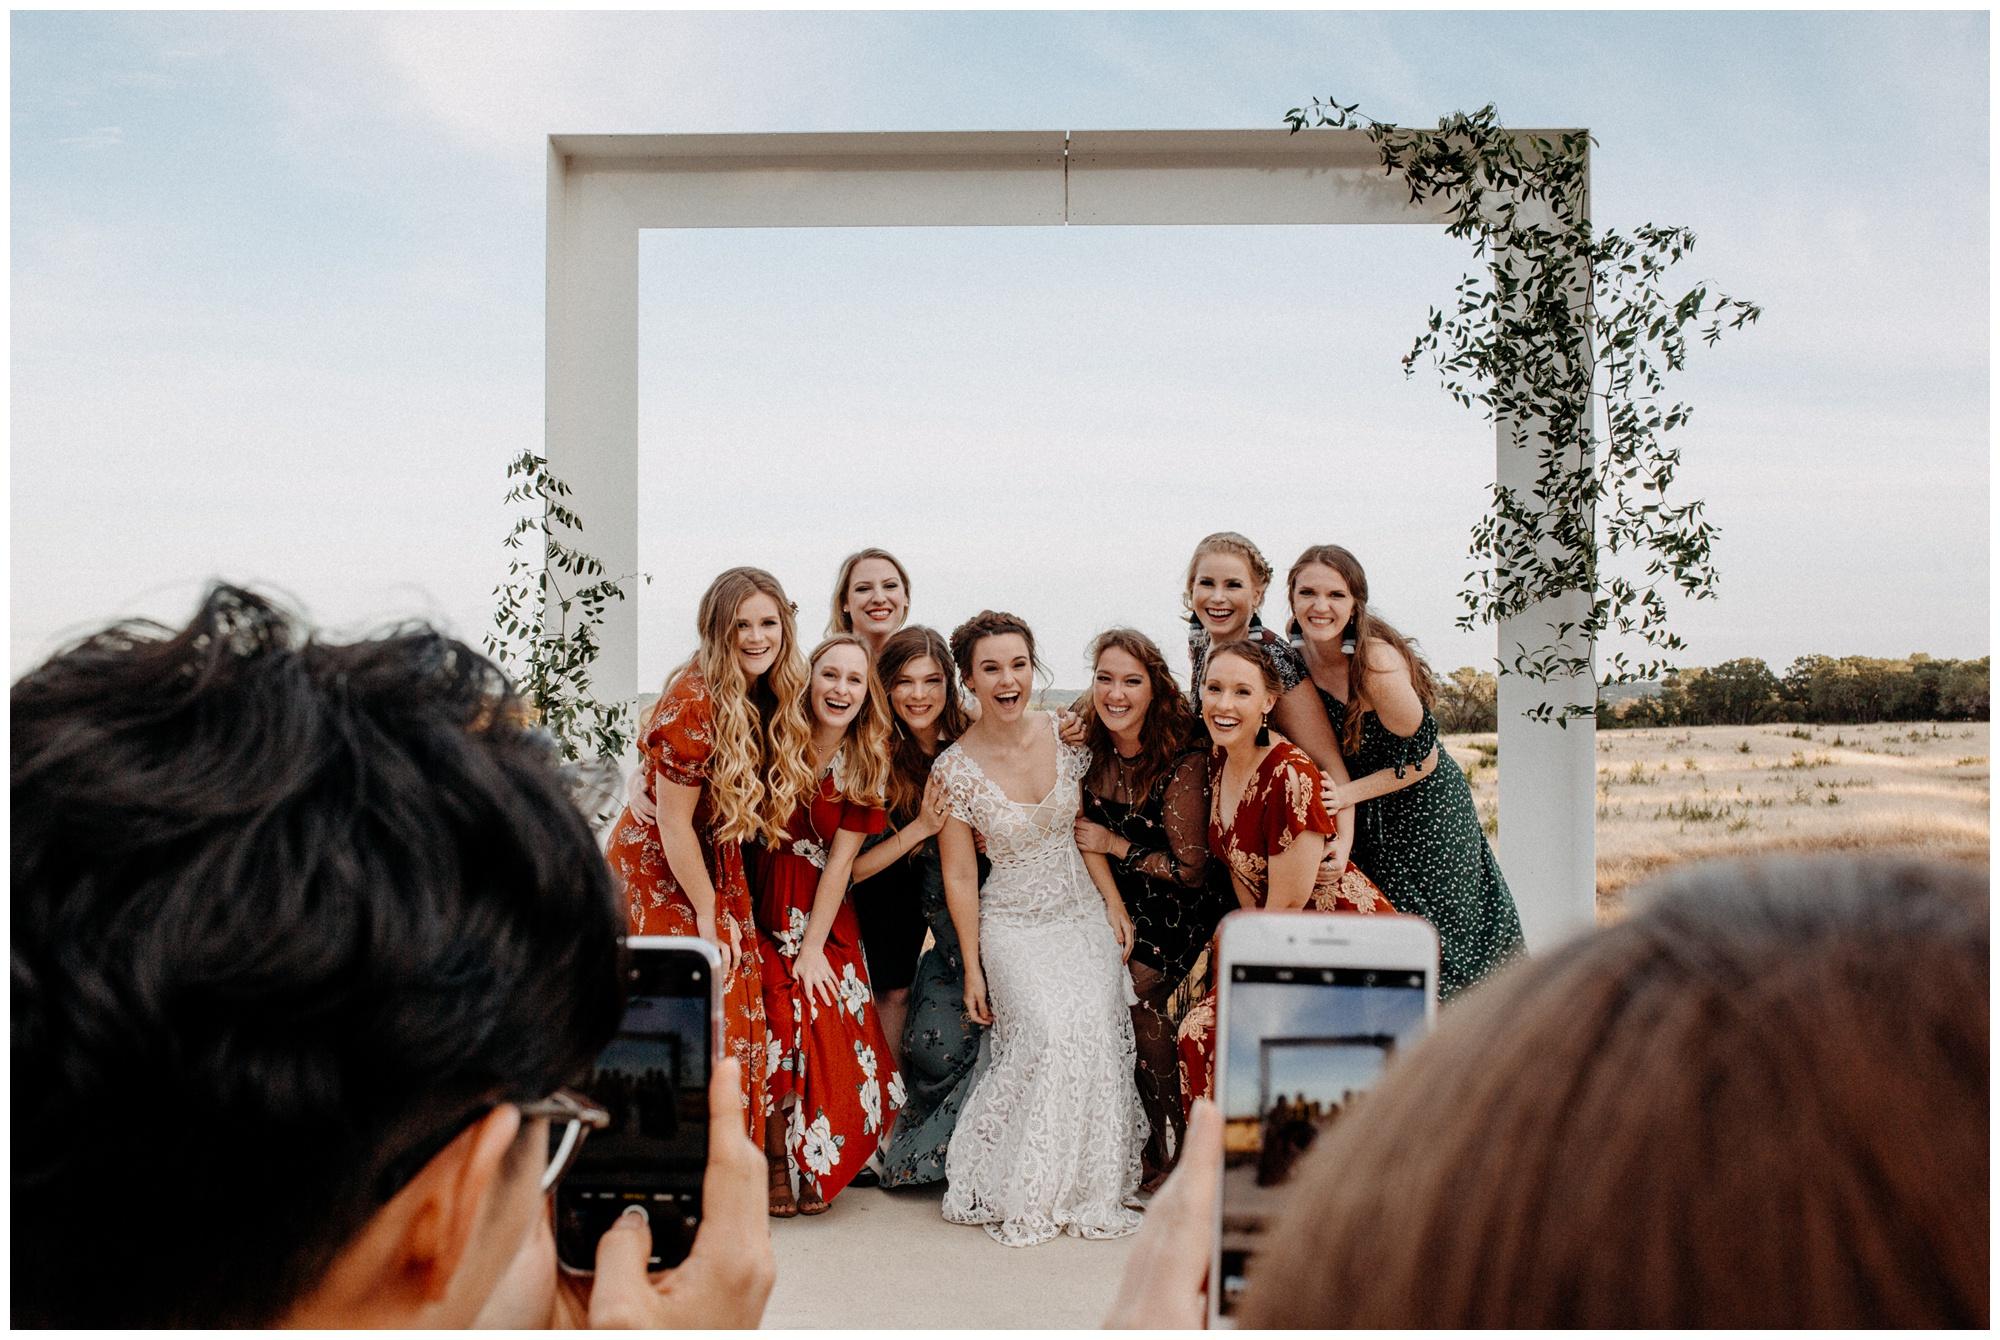 AUSTIN-TEXAS-PROSPECT-HOUSE-WEDDING-VENUE-PHOTOGRAPHY25827.JPG